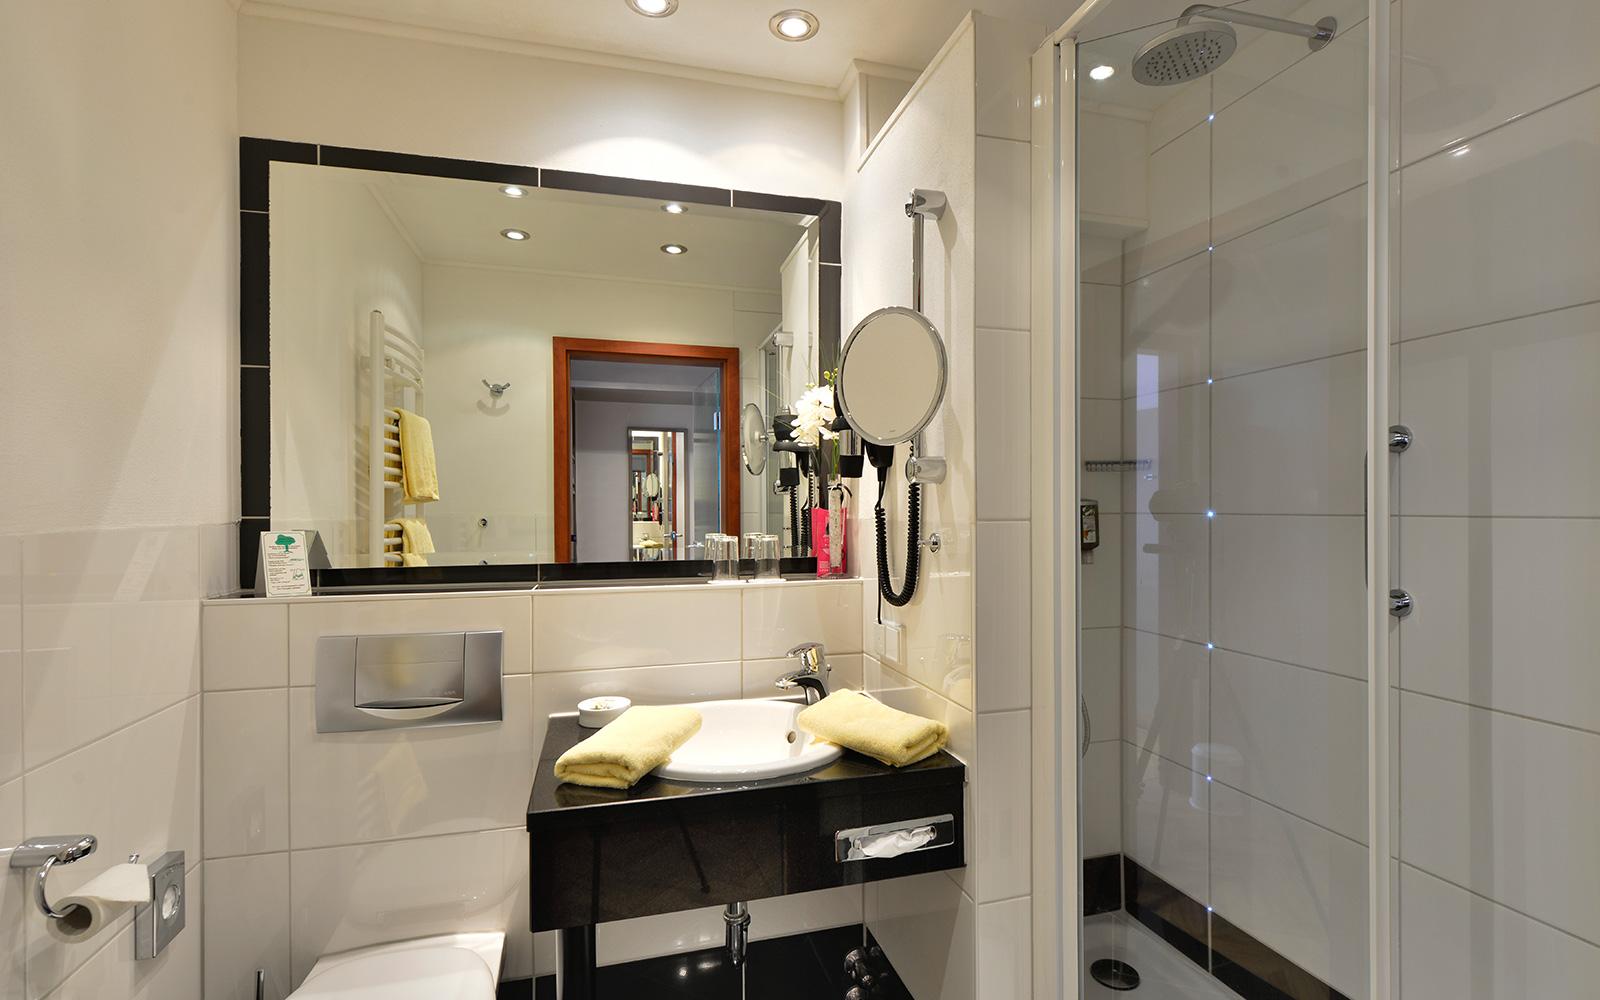 Zimmerkategorien: 4 Sterne Hotel in Celle - Hotel Caroline Mathilde